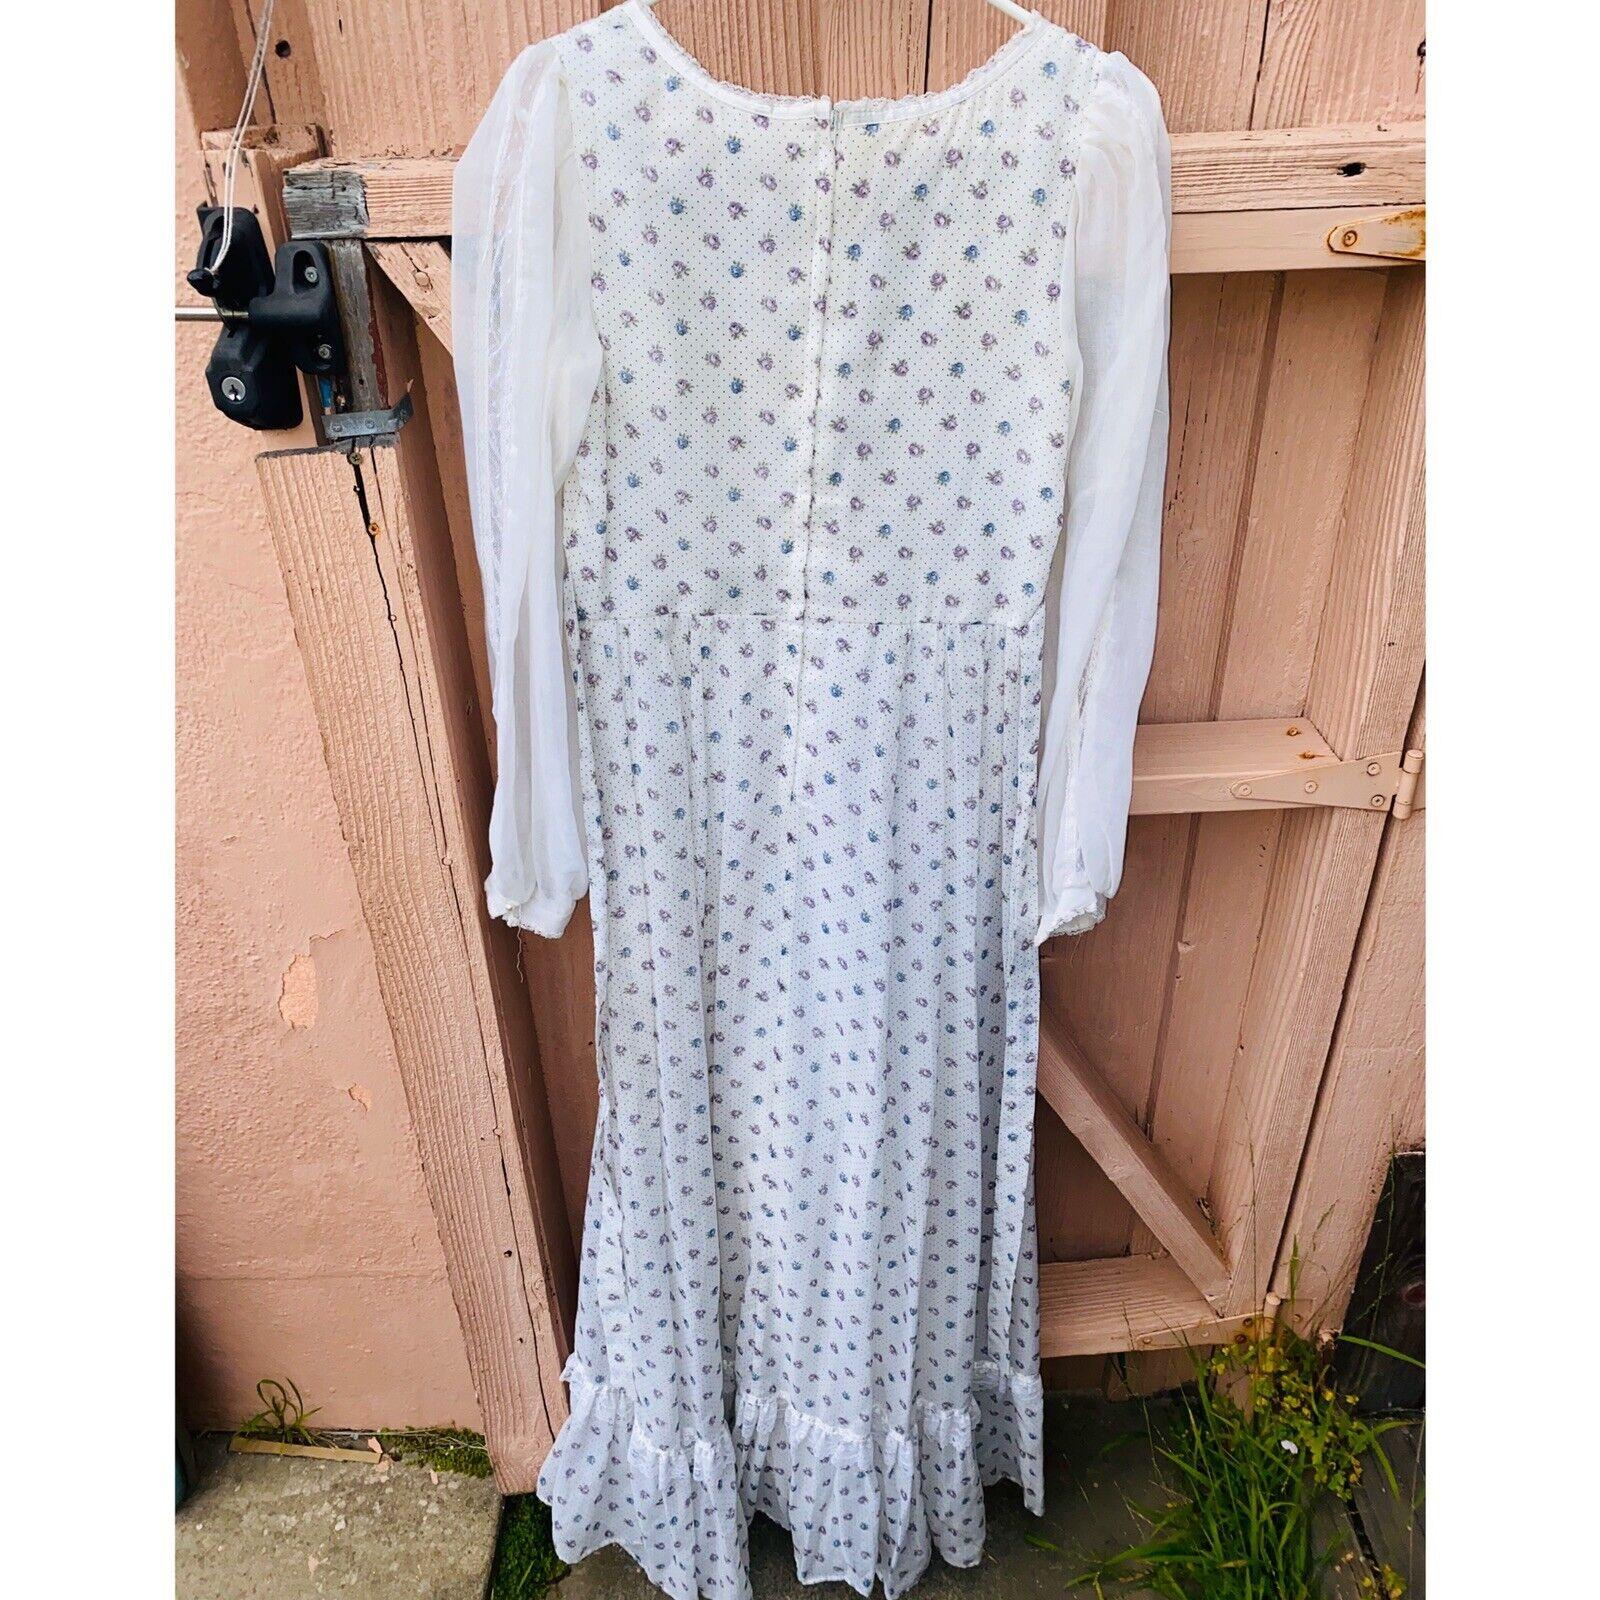 1970's Gunne Sax Prairie Cottage Core Dress - image 2